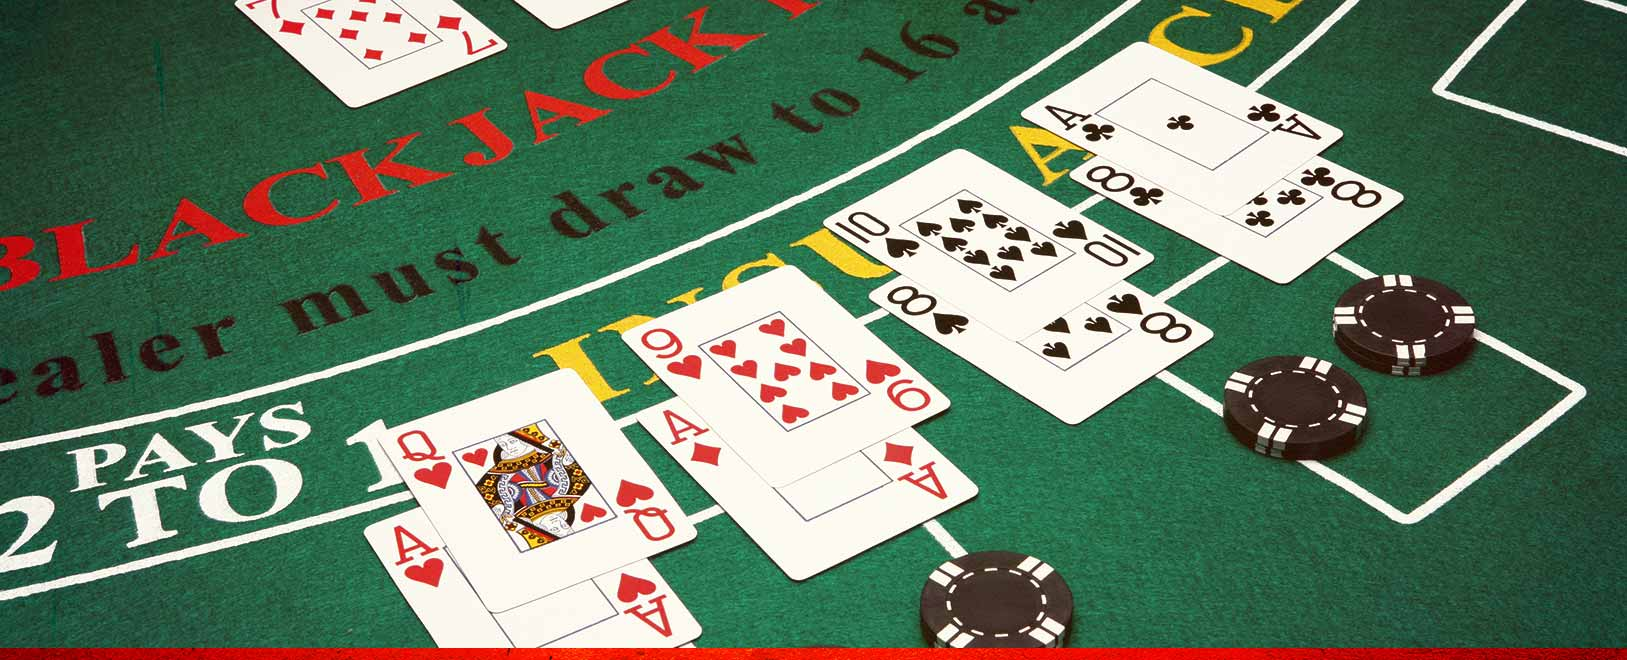 Blackjack Strategy: How to Split Pairs